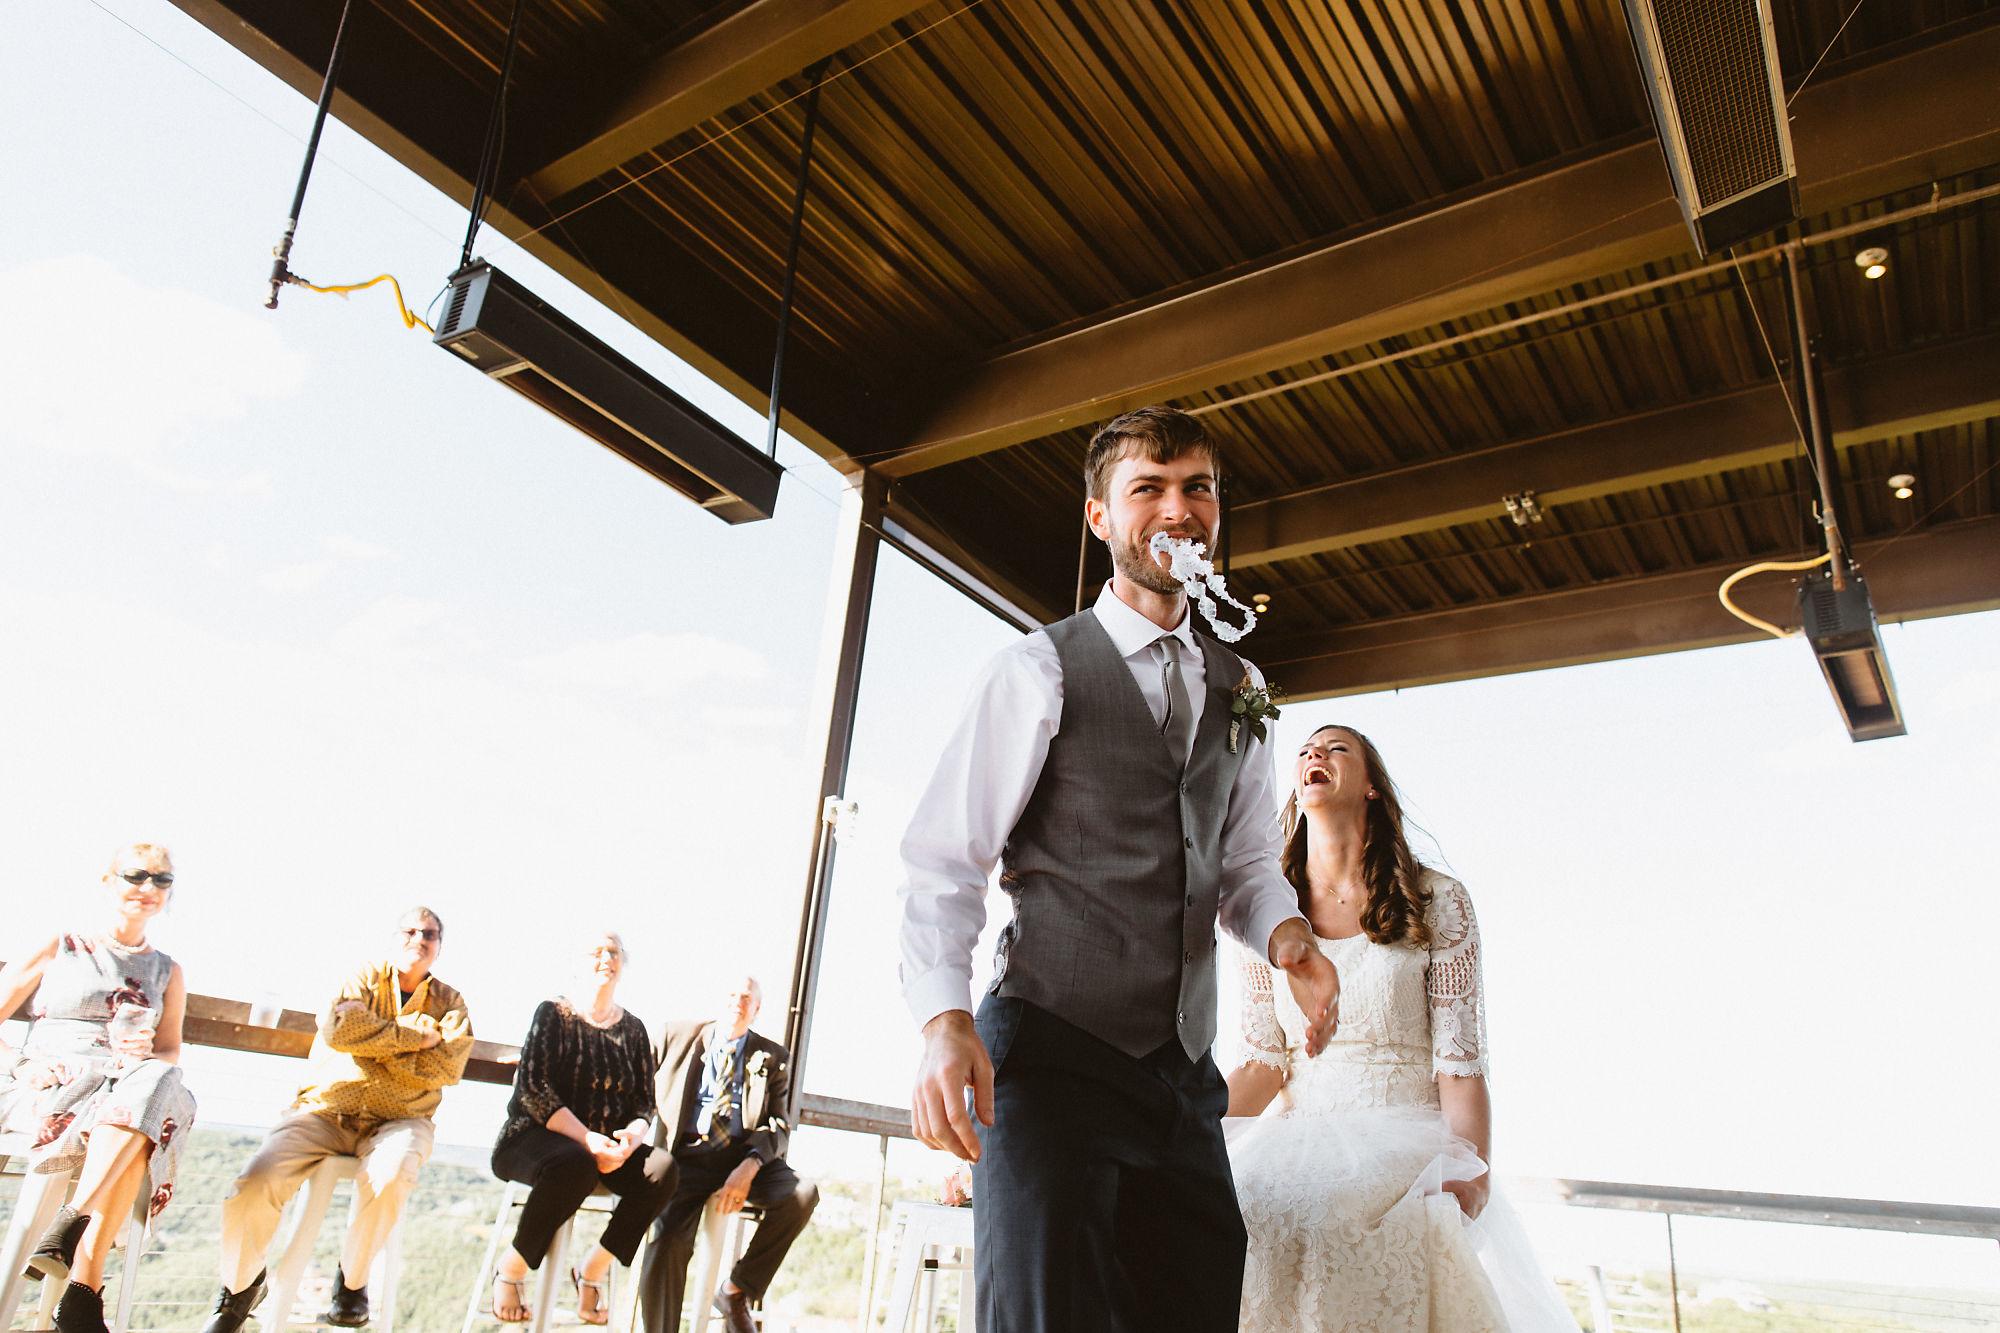 jessica_austin_oasis_brewery_wedding_photos162155.jpg